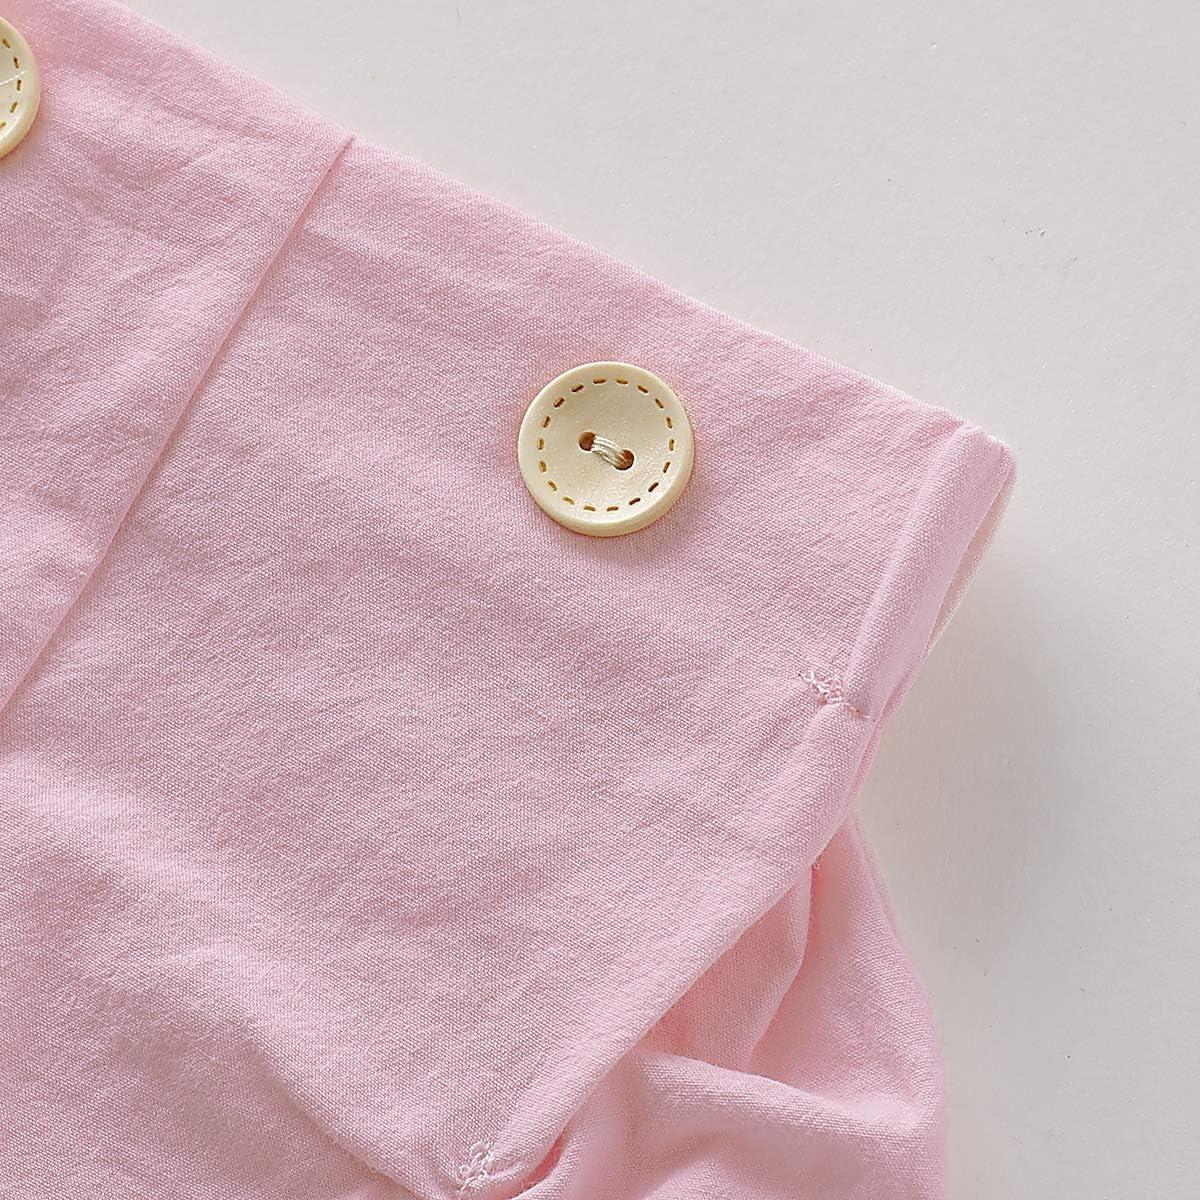 Toddler Baby Boy Girl Cotton Pants Diaper Shorts Bottoms PP Bloomers Panties